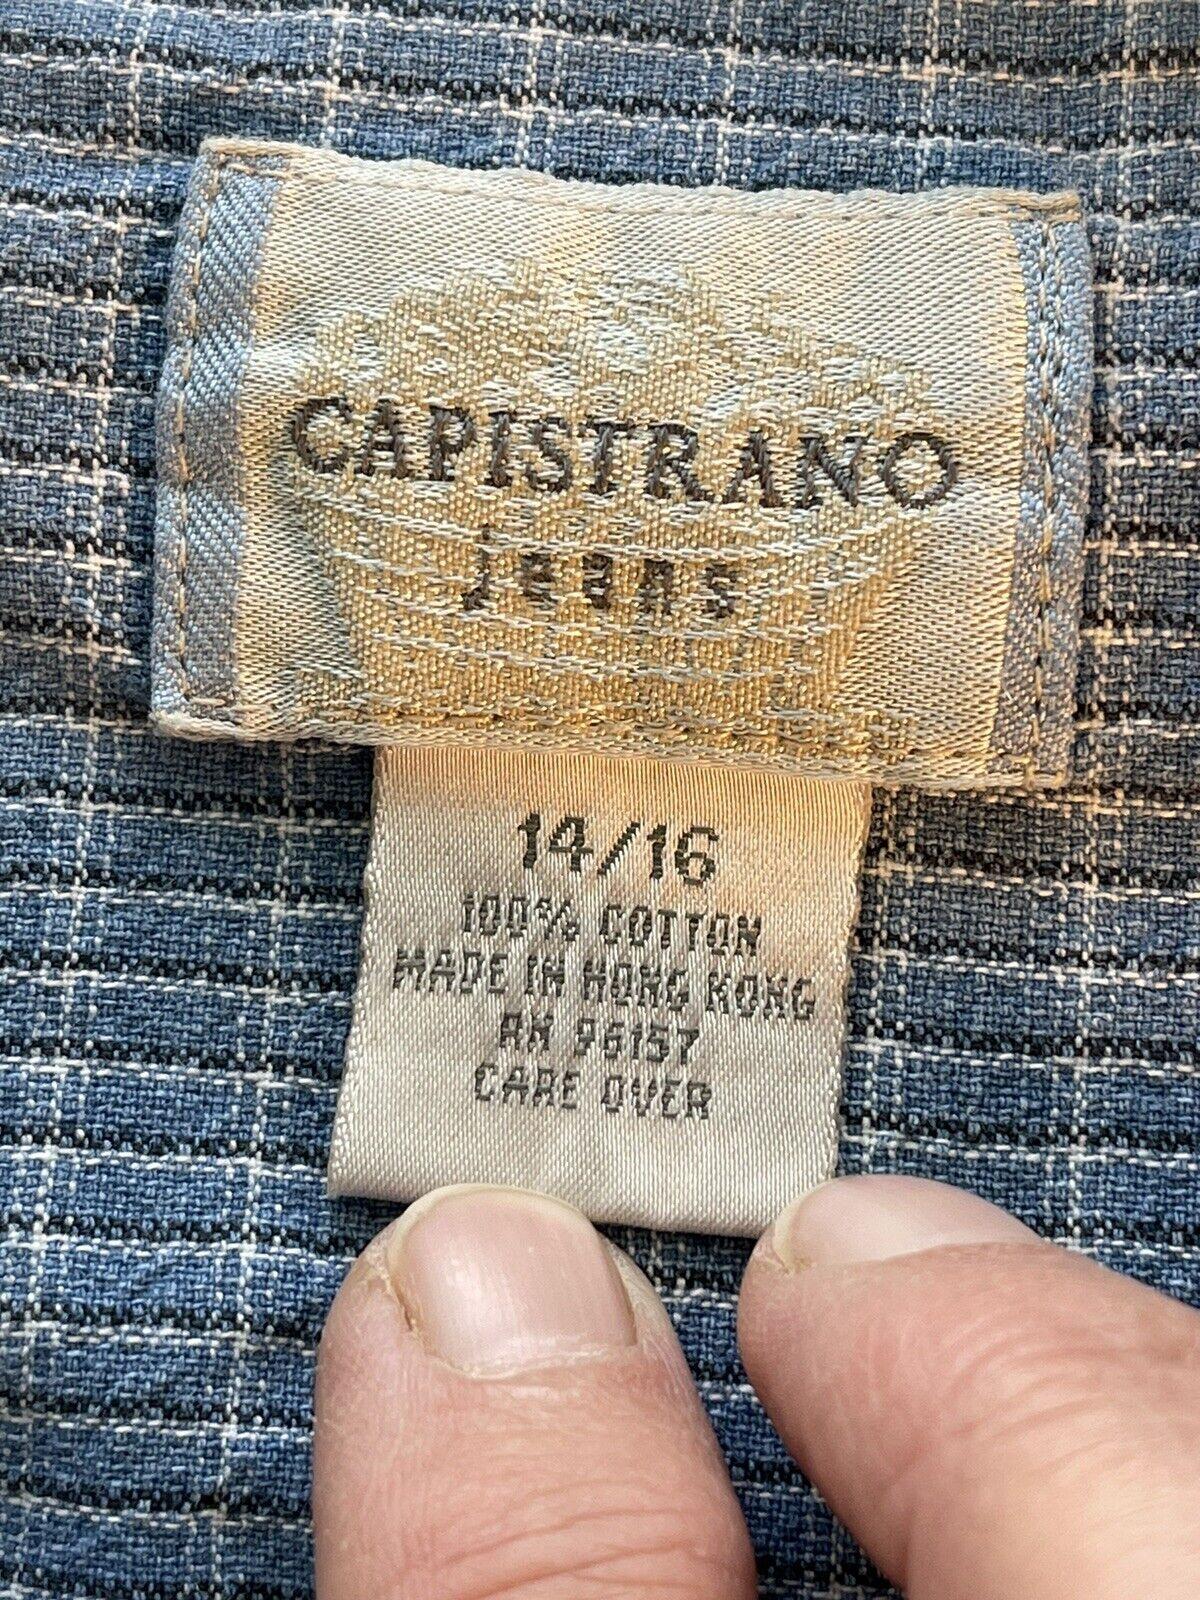 capristrano jeans jacket shirt - image 4